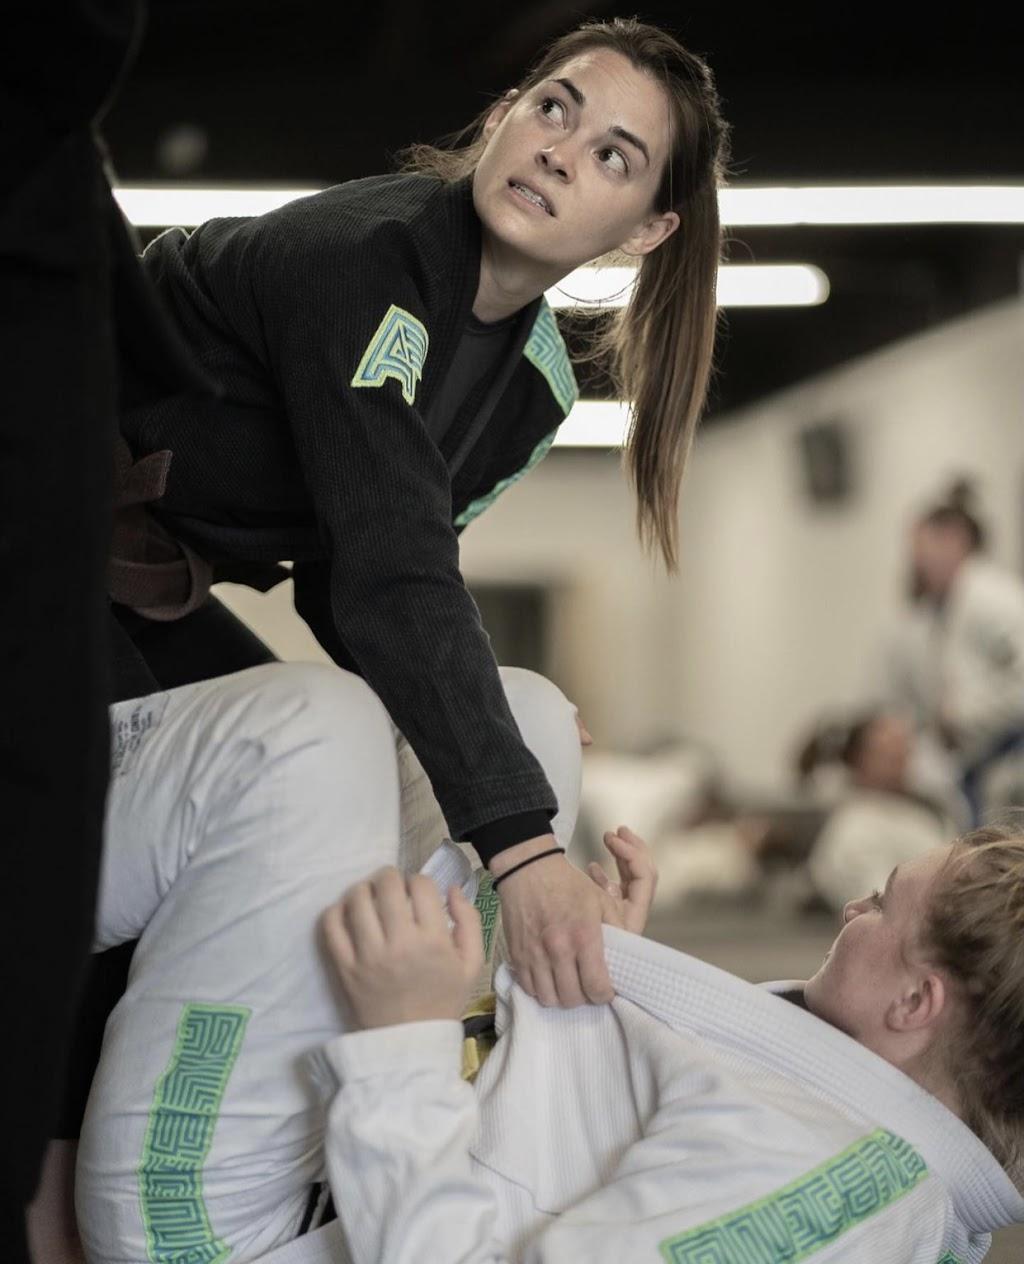 Logic Jiu Jitsu, Muay Thai, & Martial Arts - health  | Photo 4 of 10 | Address: 1360 N American St, Philadelphia, PA 19122, USA | Phone: (215) 593-0060